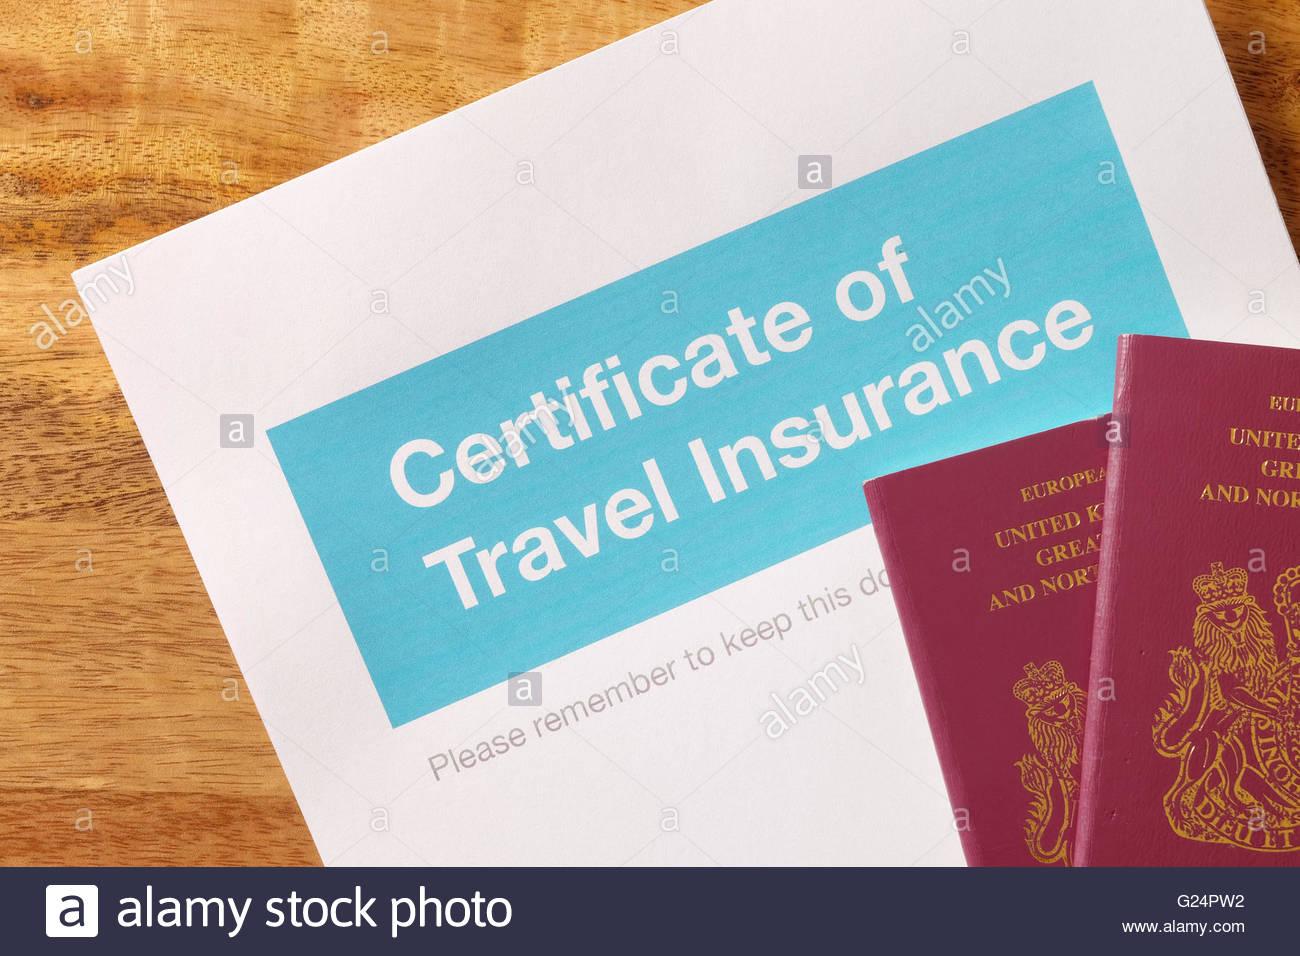 Travel insurance certificate with UK passports - Stock Image